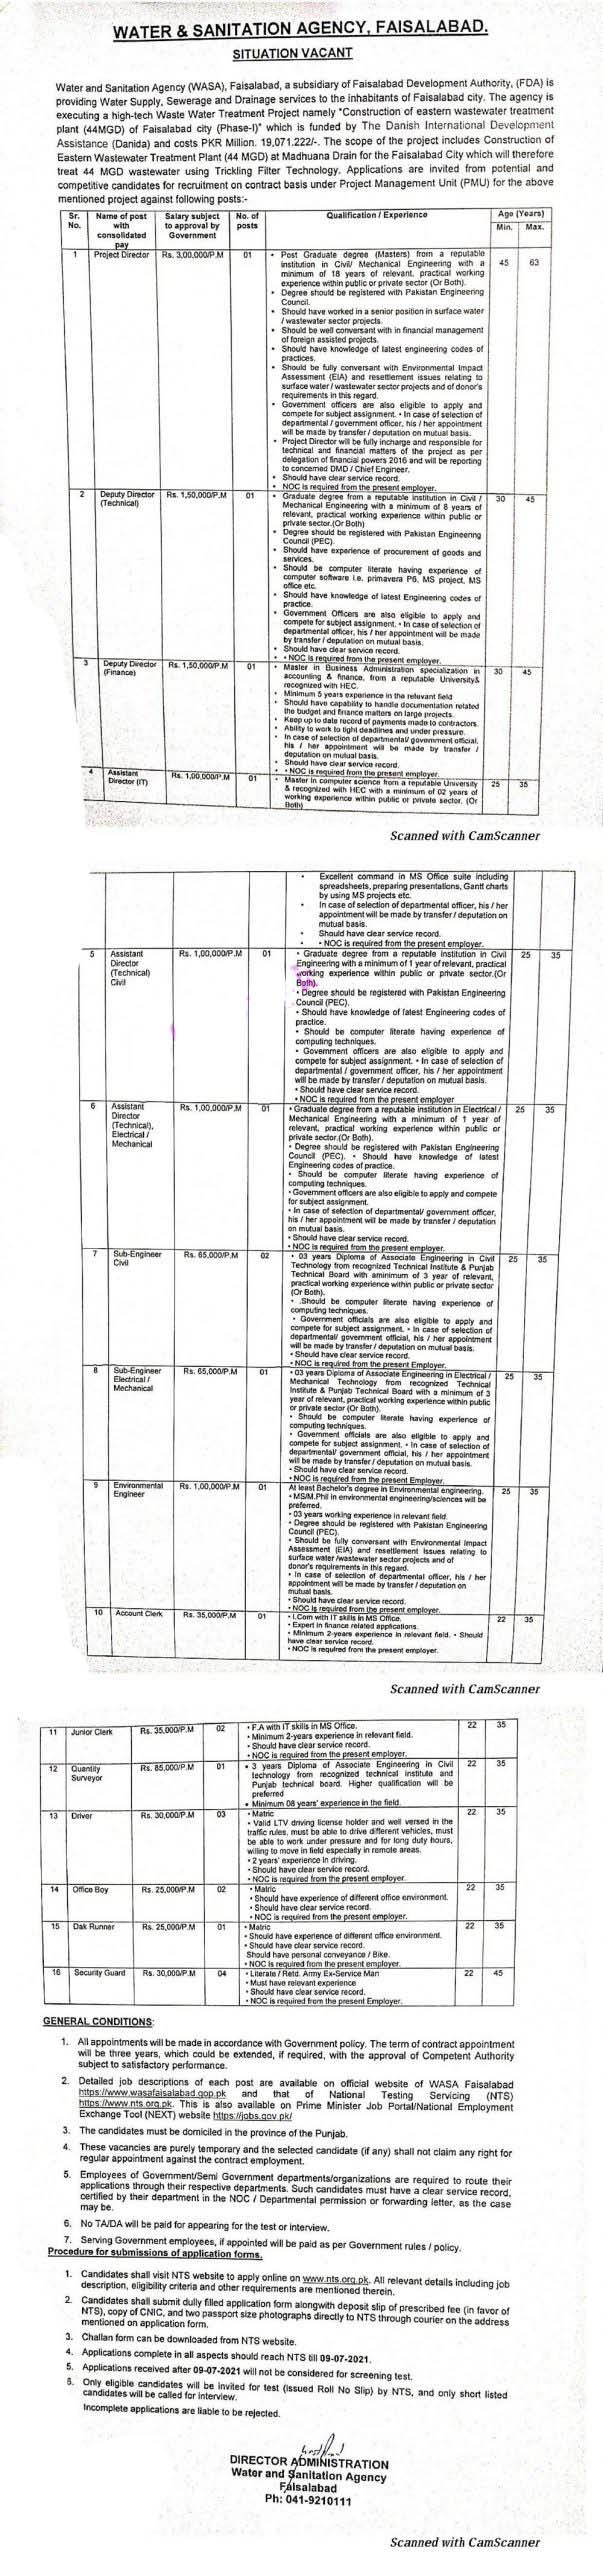 Latest Jobs in Water and Sanitation Agency WASA Faisalabad 2021